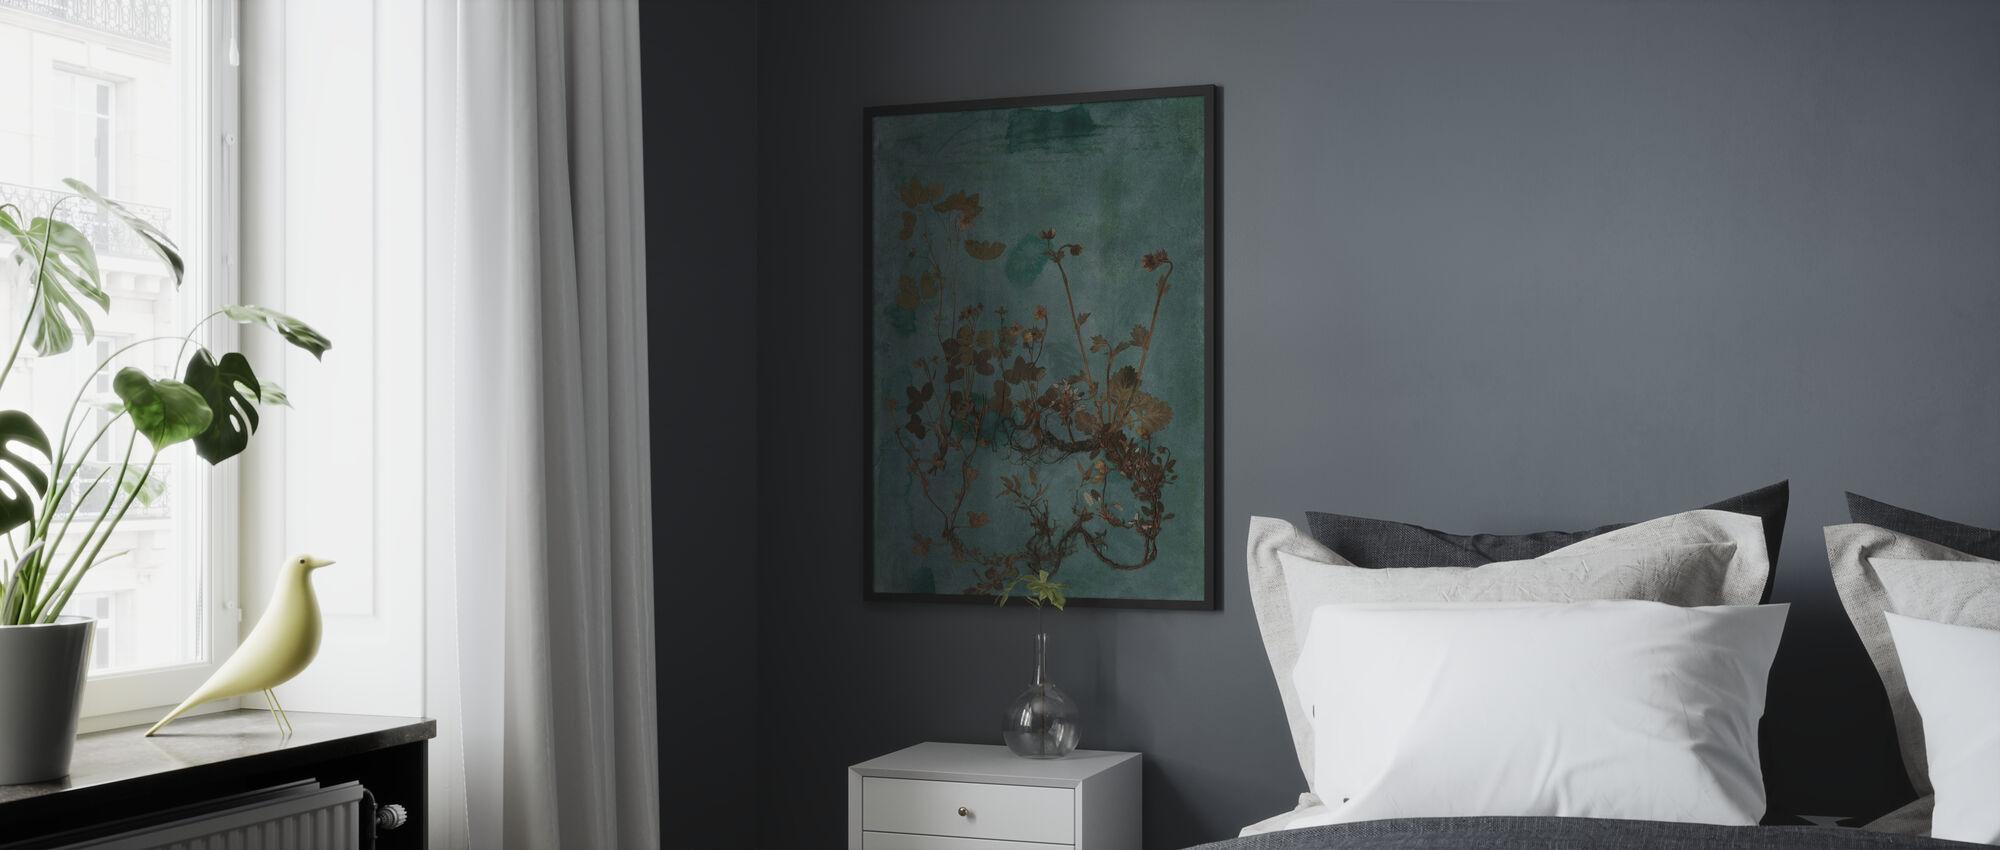 Rhizome - Impression encadree - Chambre